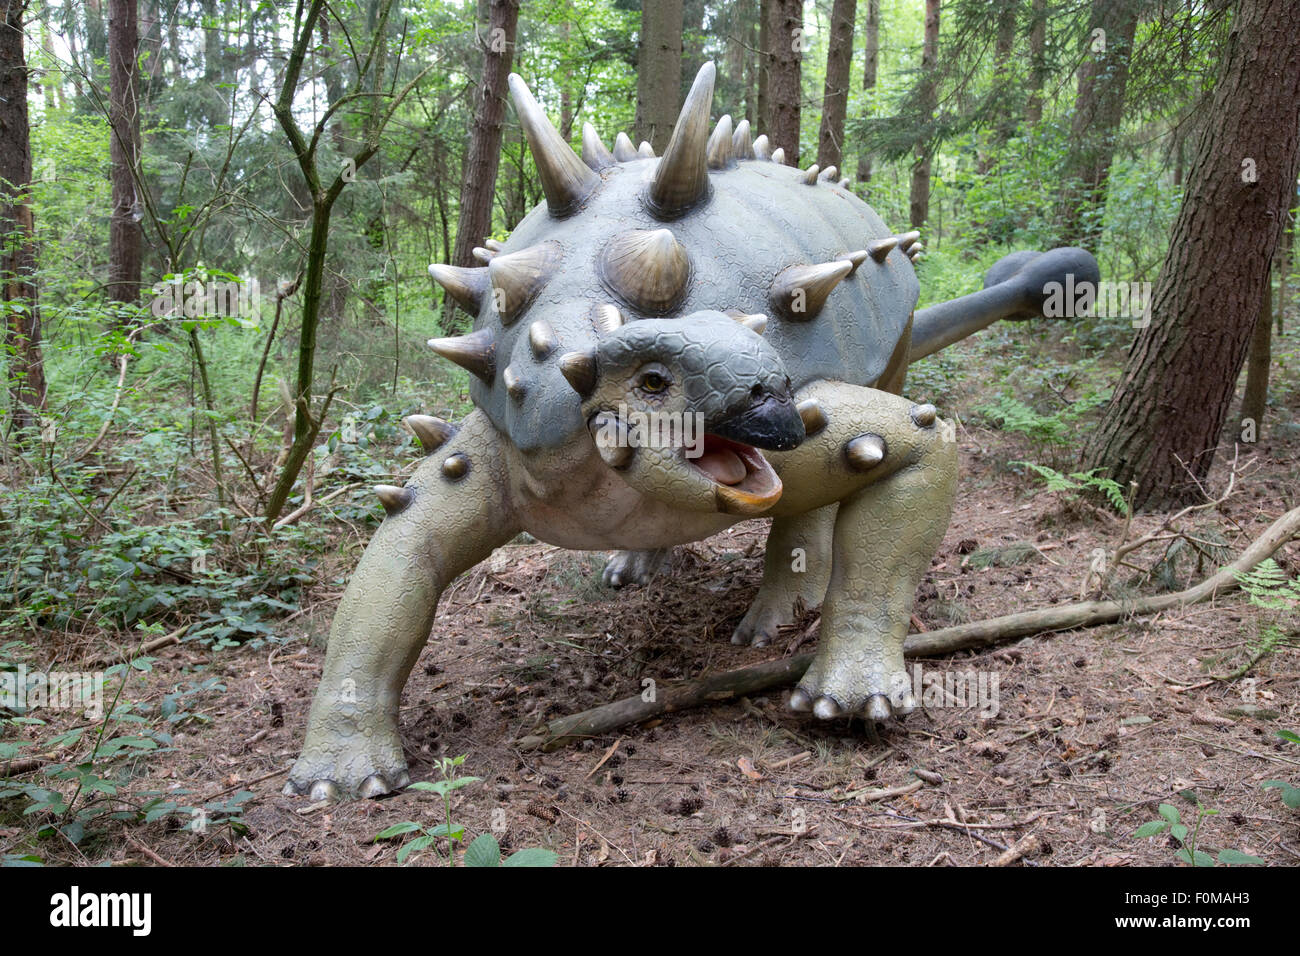 Ankylosaurus is a genus of ankylosaurid dinosaur. Fossils of Ankylosaurus have been found in geologic formations - Stock Image